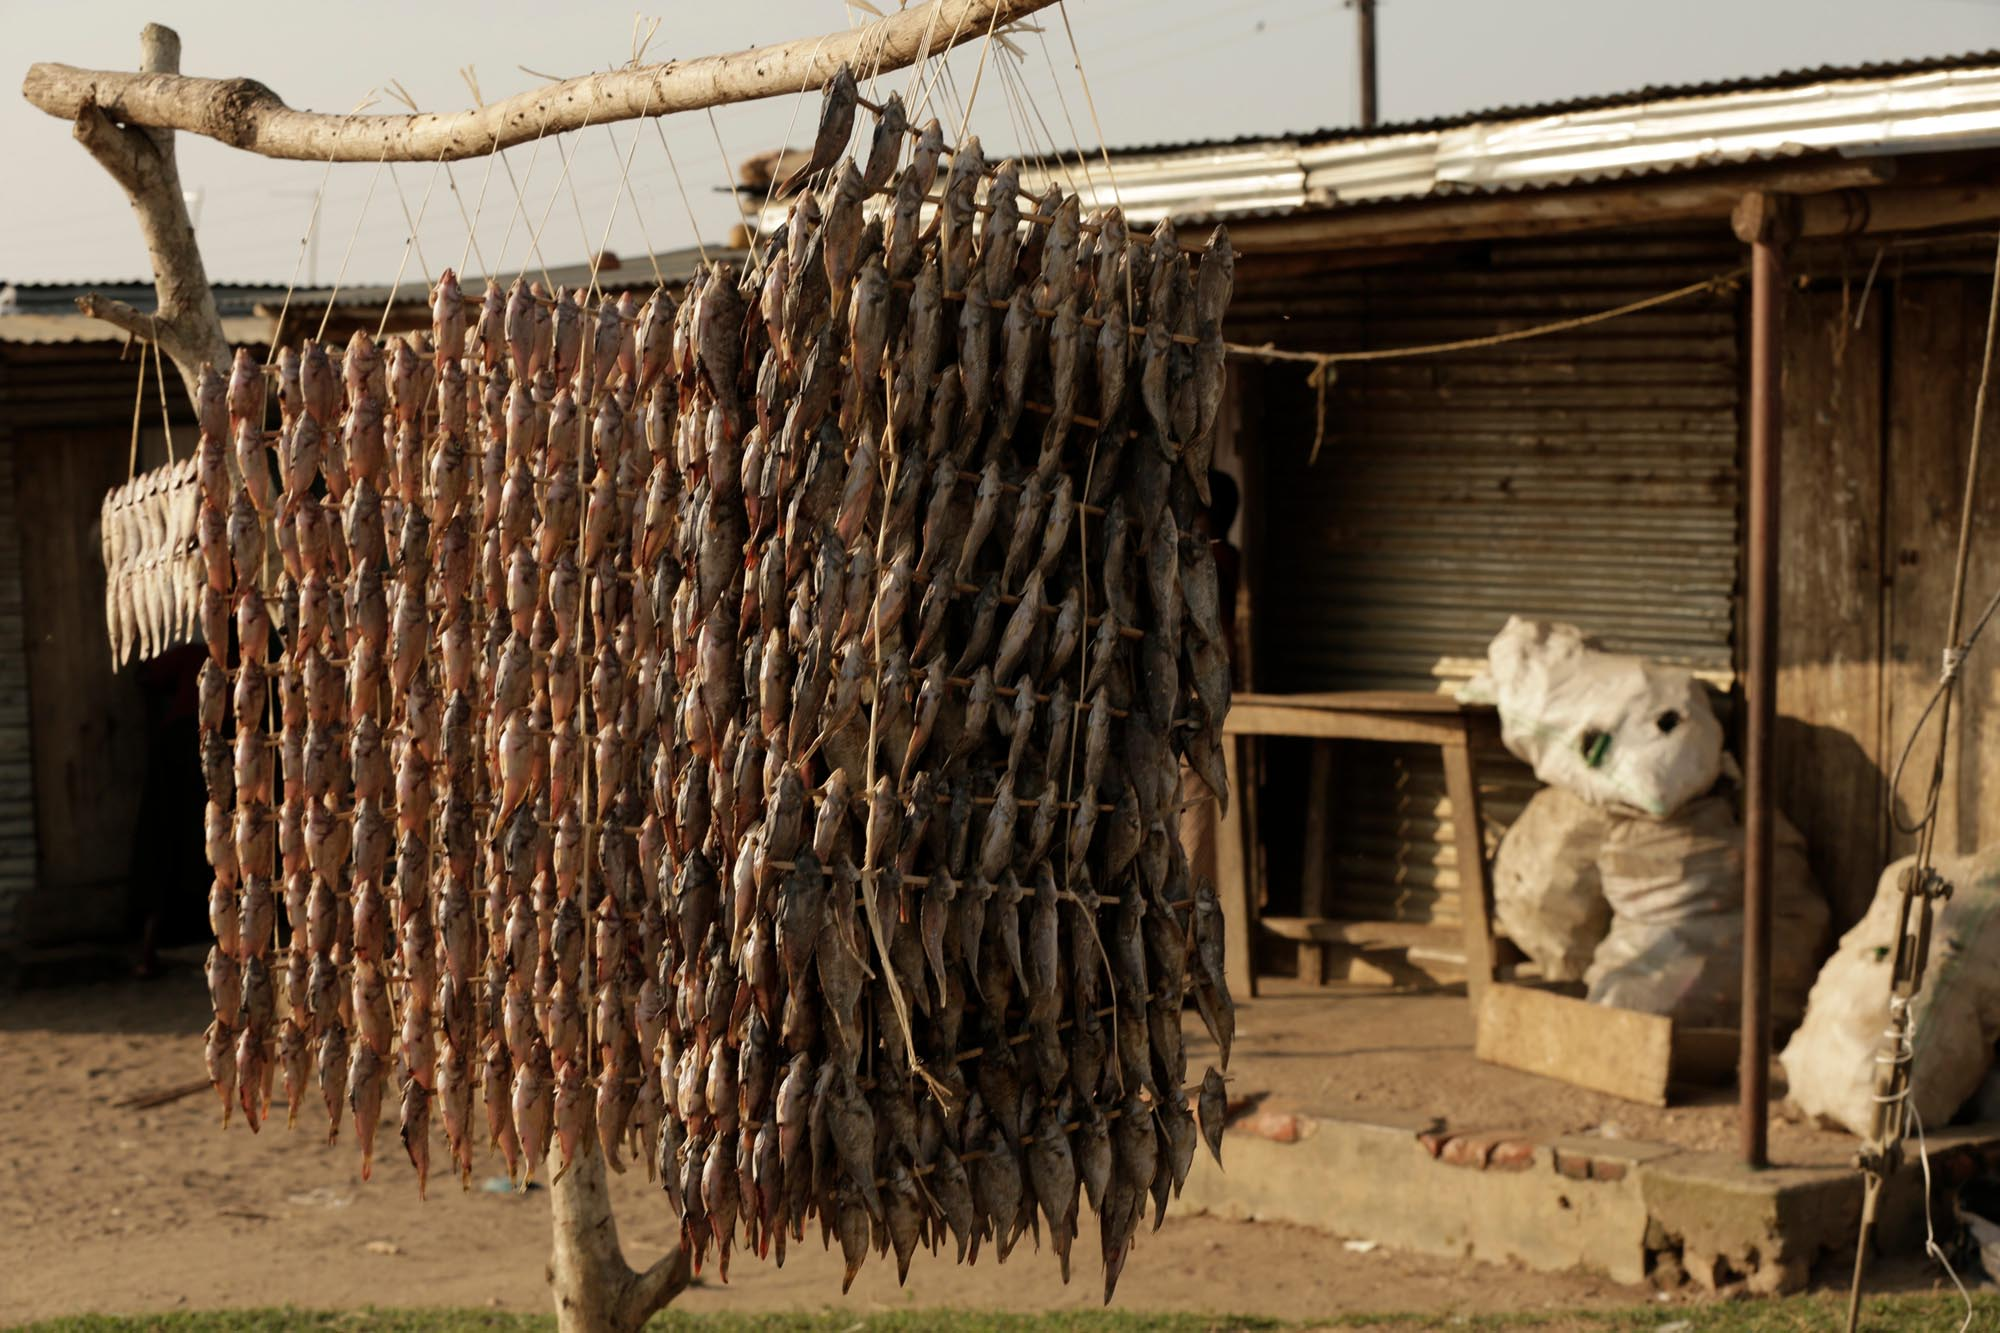 Fish drying, Kachanga, Lake Victoria, Uganda